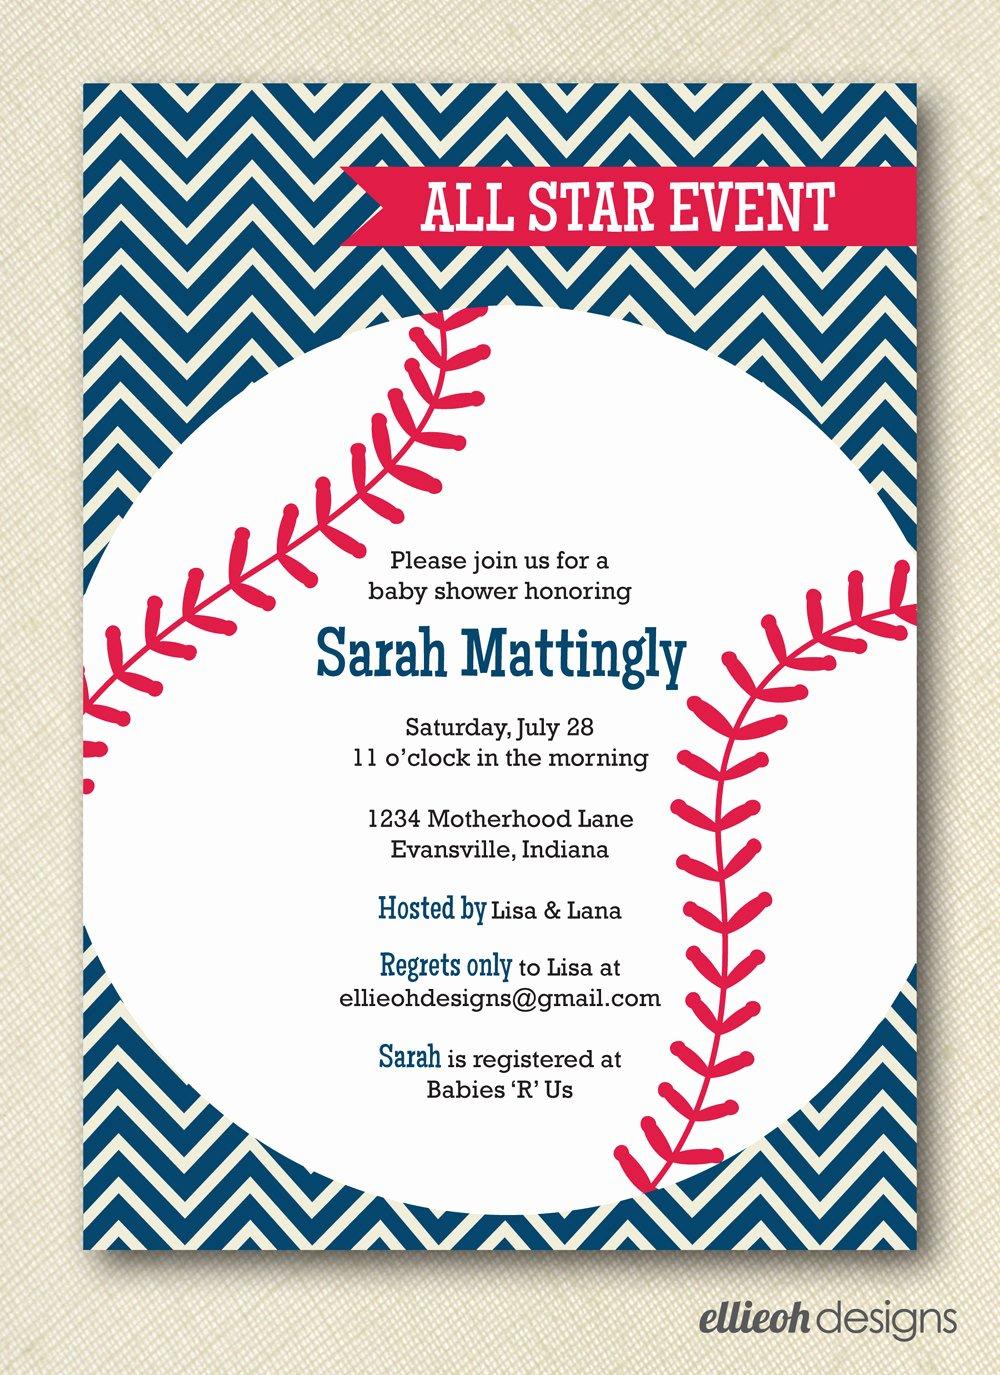 photo regarding Free Printable Baseball Birthday Invitations titled Cost-free Printable Baseball Birthday Invites Free of charge Latter